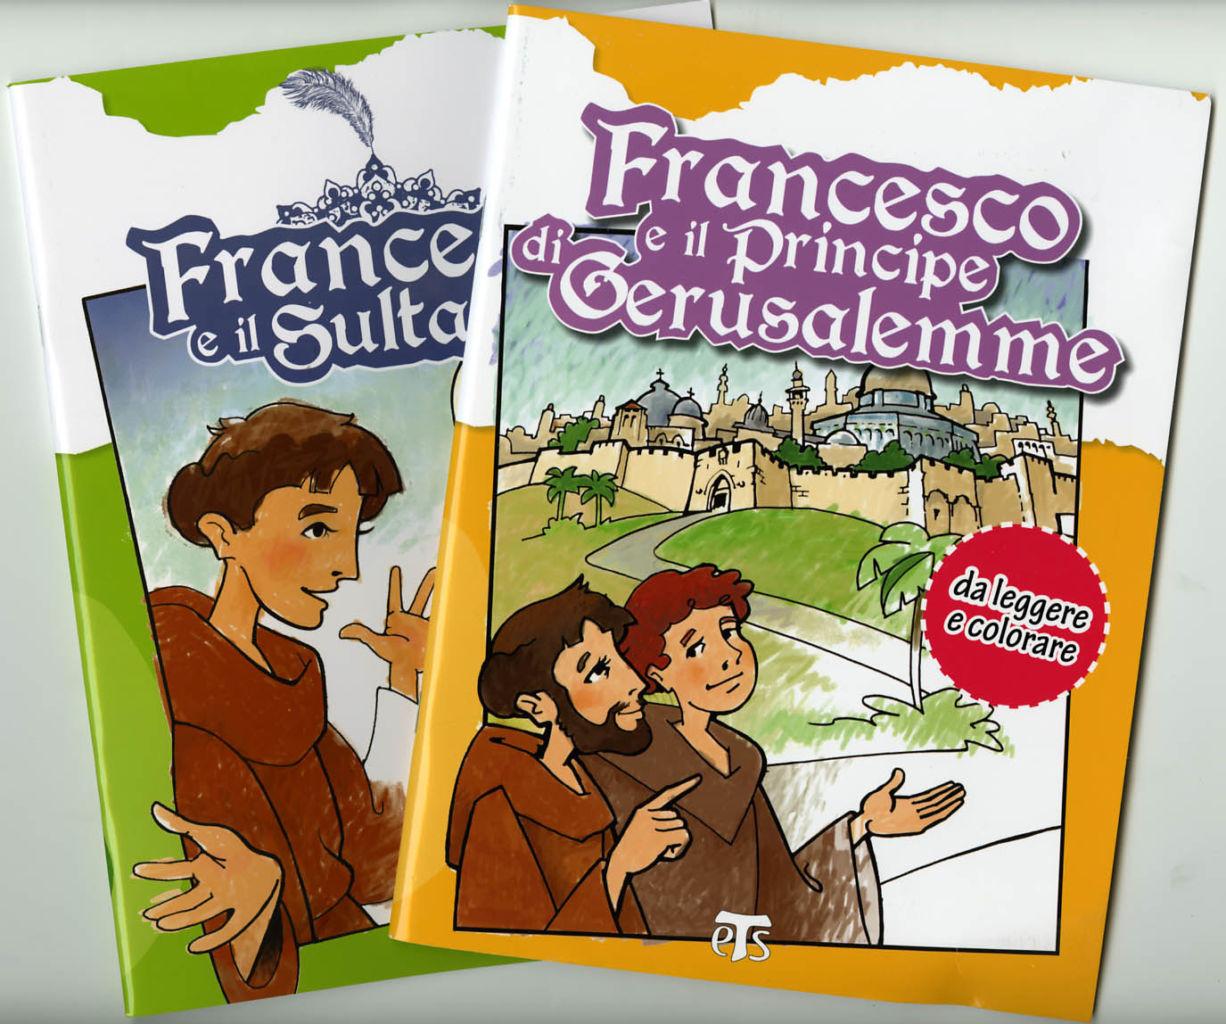 Offerta san Francesco da colorare - Ivano Ceriani